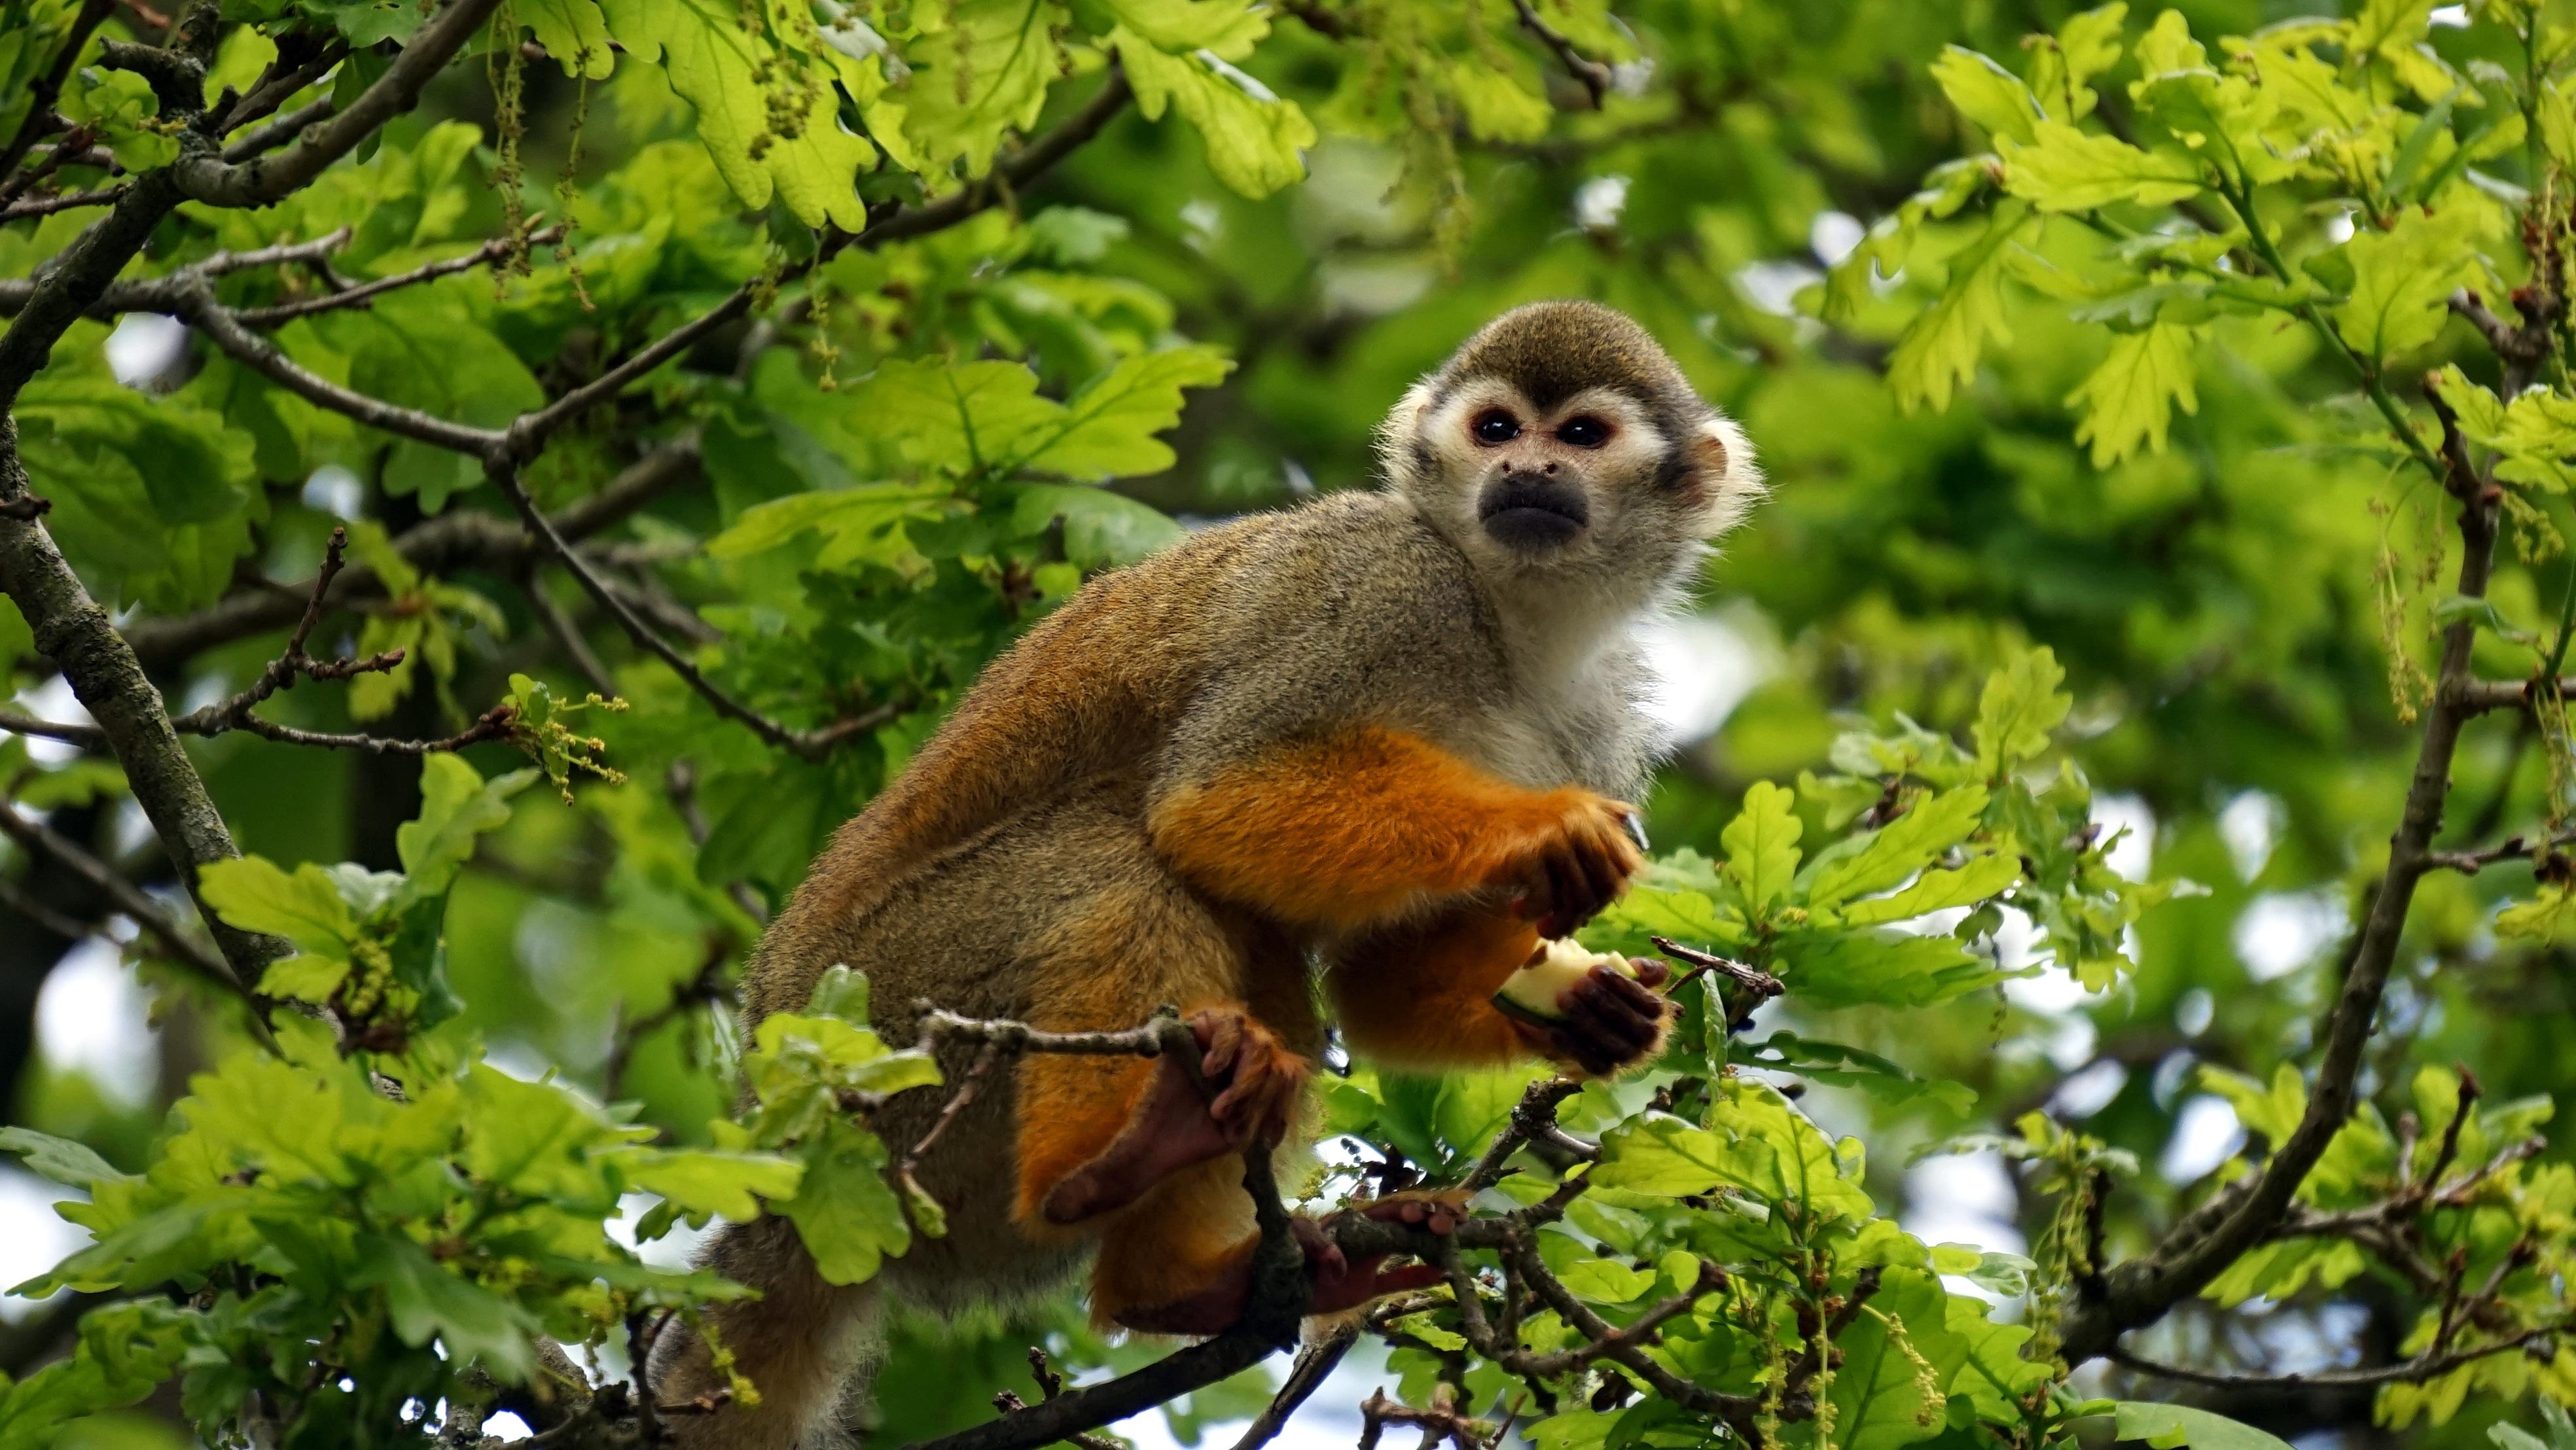 Squirrel monkeys in trees - photo#40